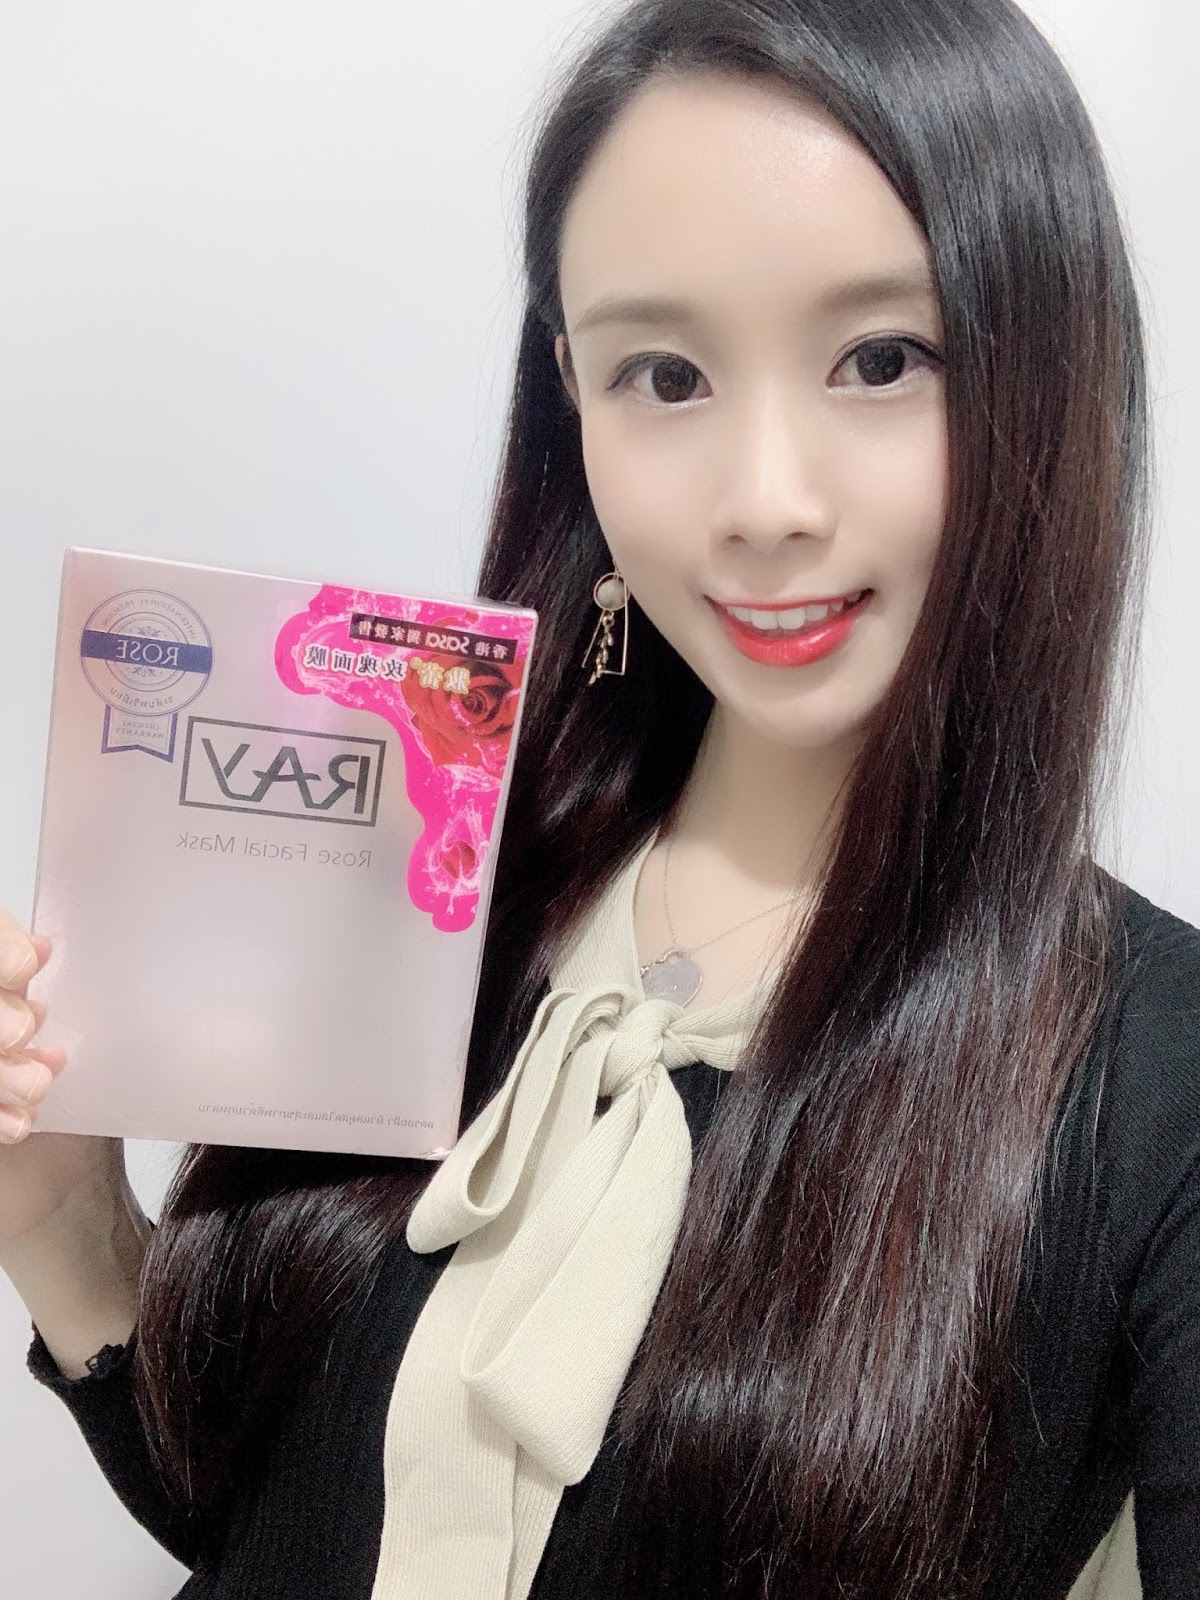 3581ed508c Beautylife HK - ◕◡◕全球首發‧SASA獨家限售♥妝蕾®RAY玫瑰純露野麥仁 ...